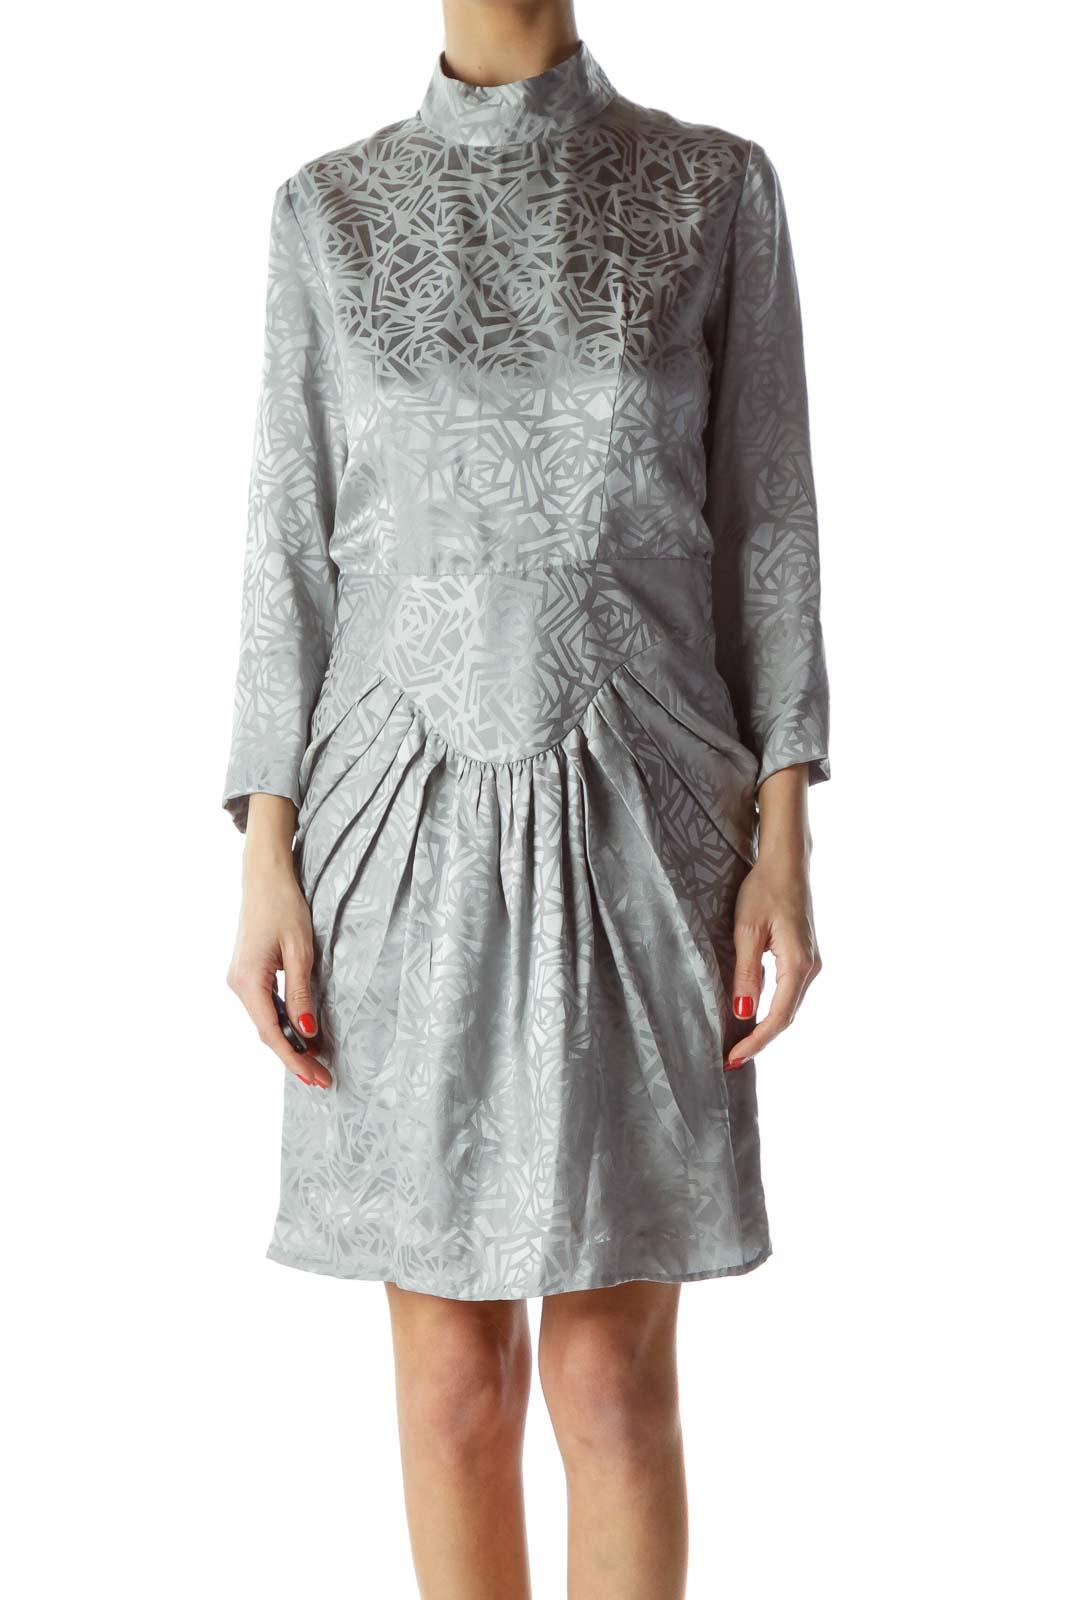 Silver Shiny Geometric Print Dress Front